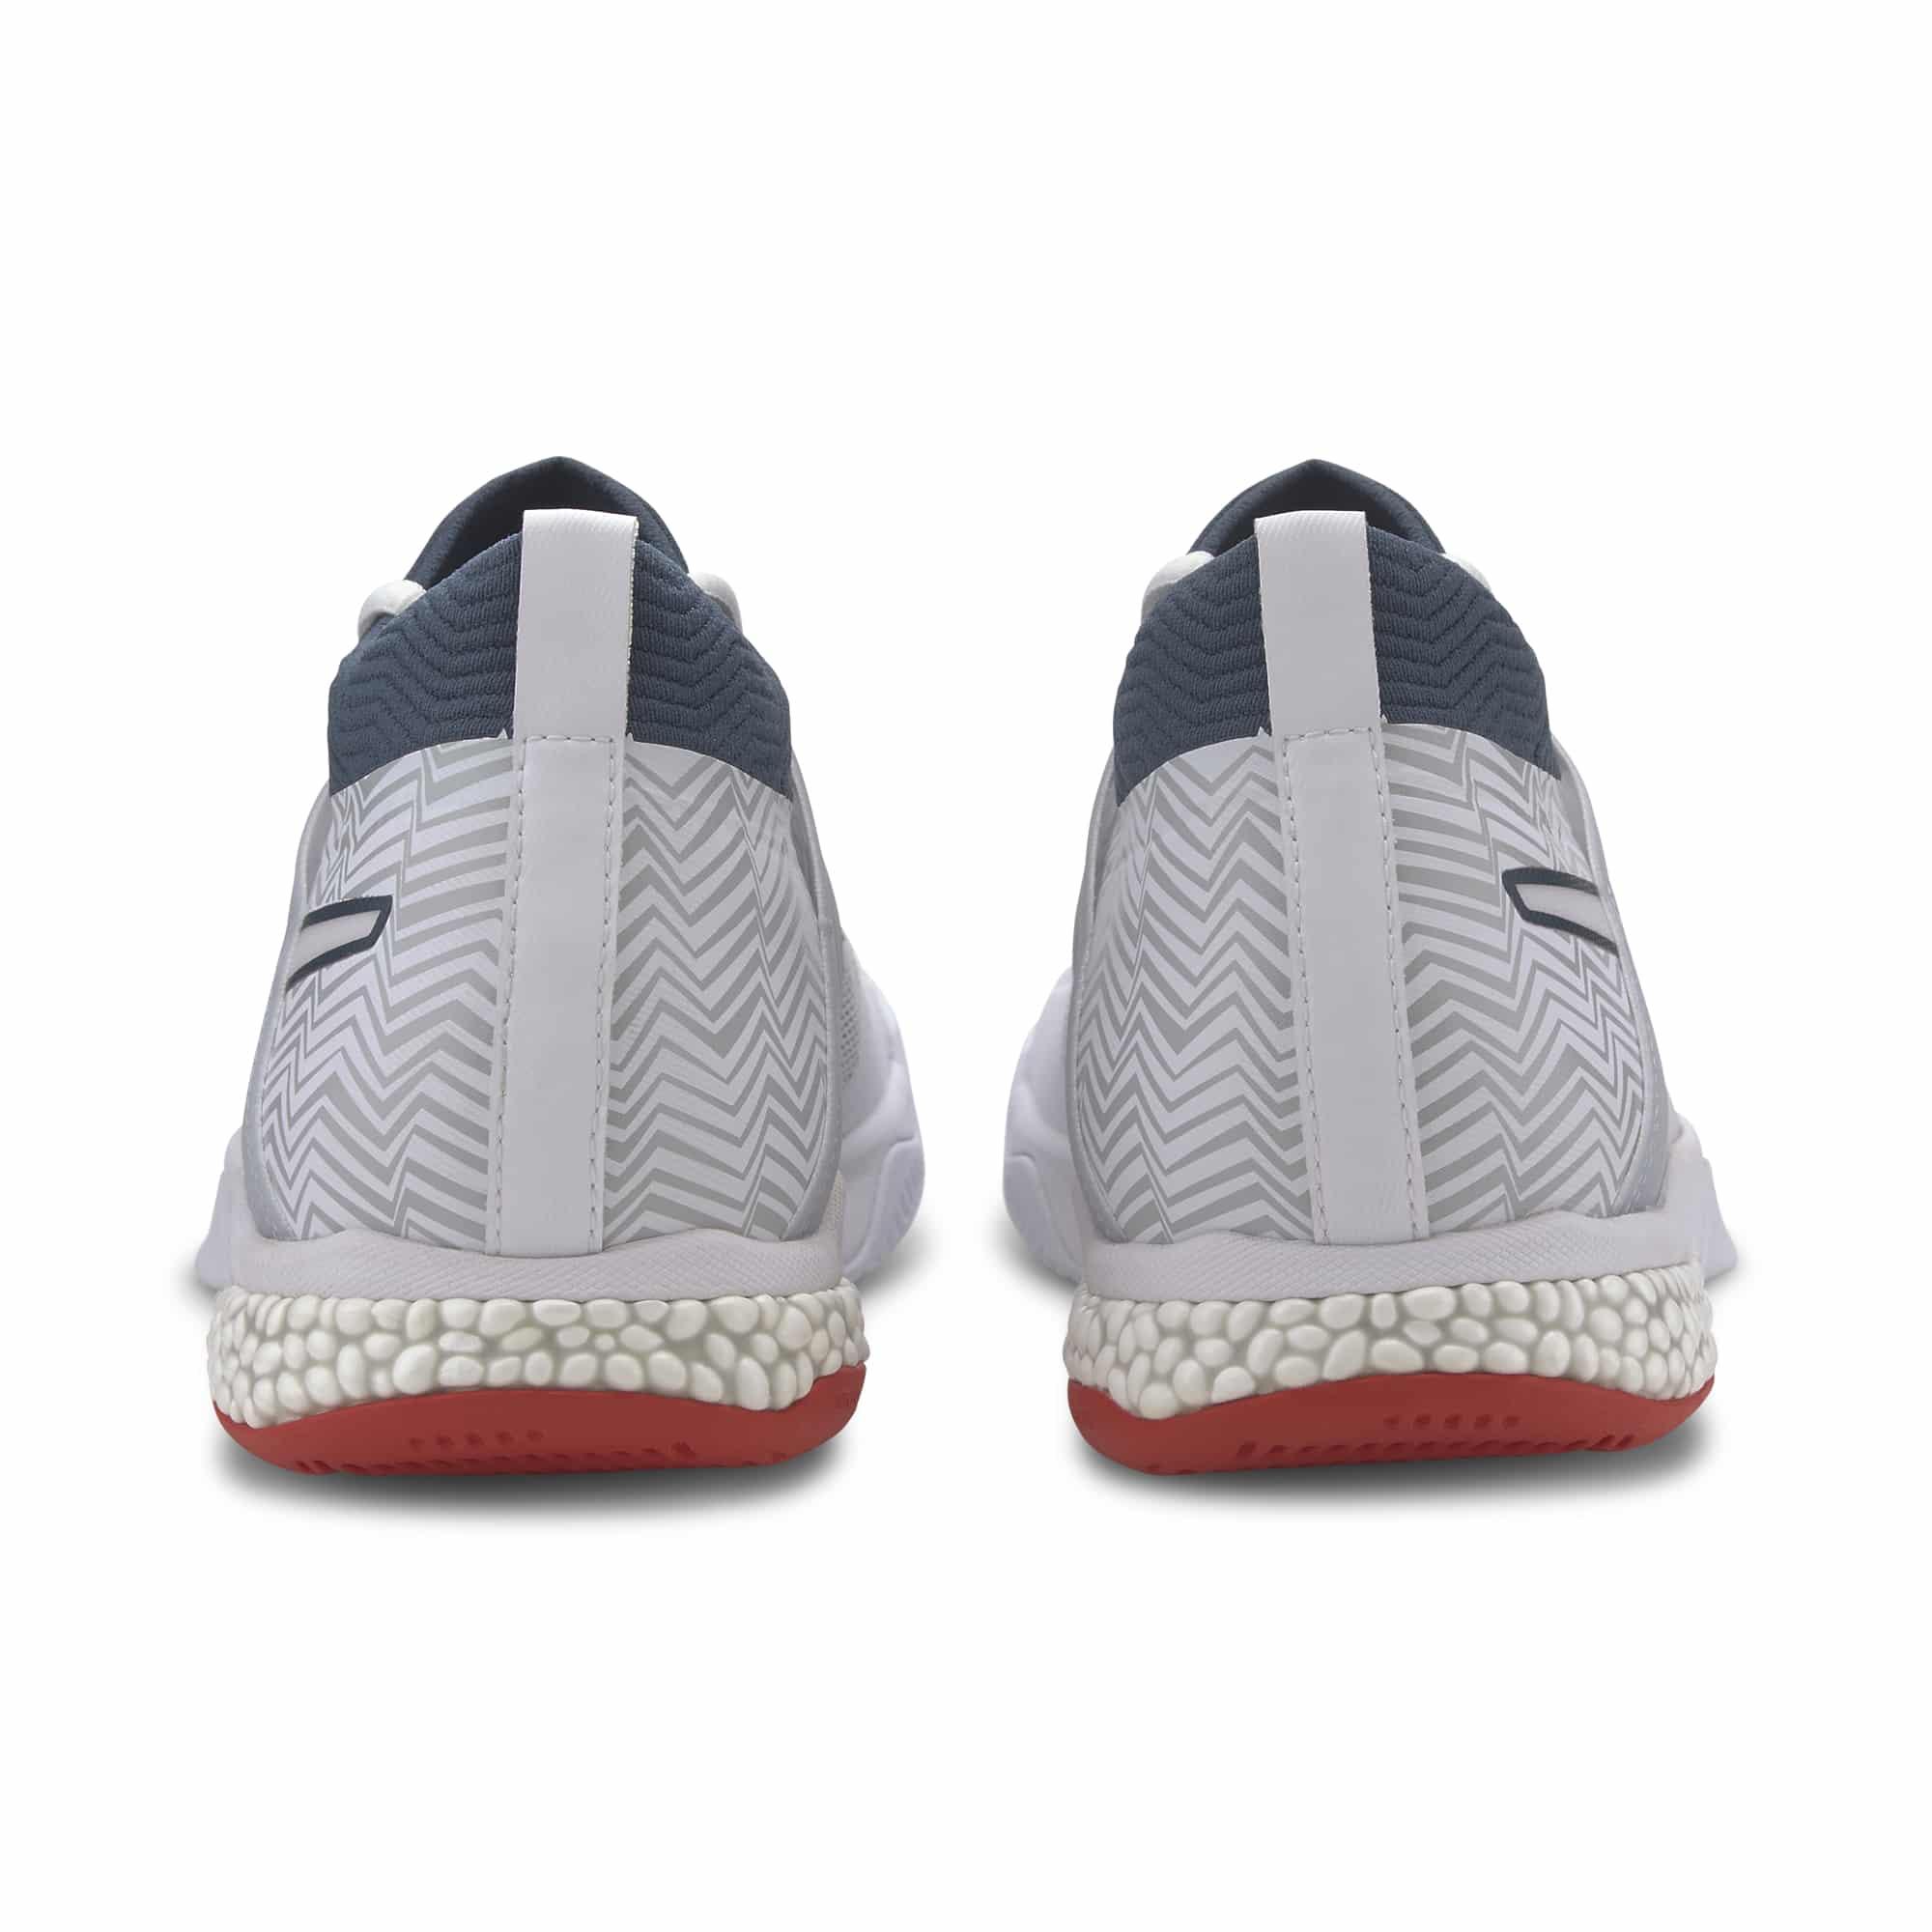 puma-explode-eh-1-chaussures-hand-2020-1